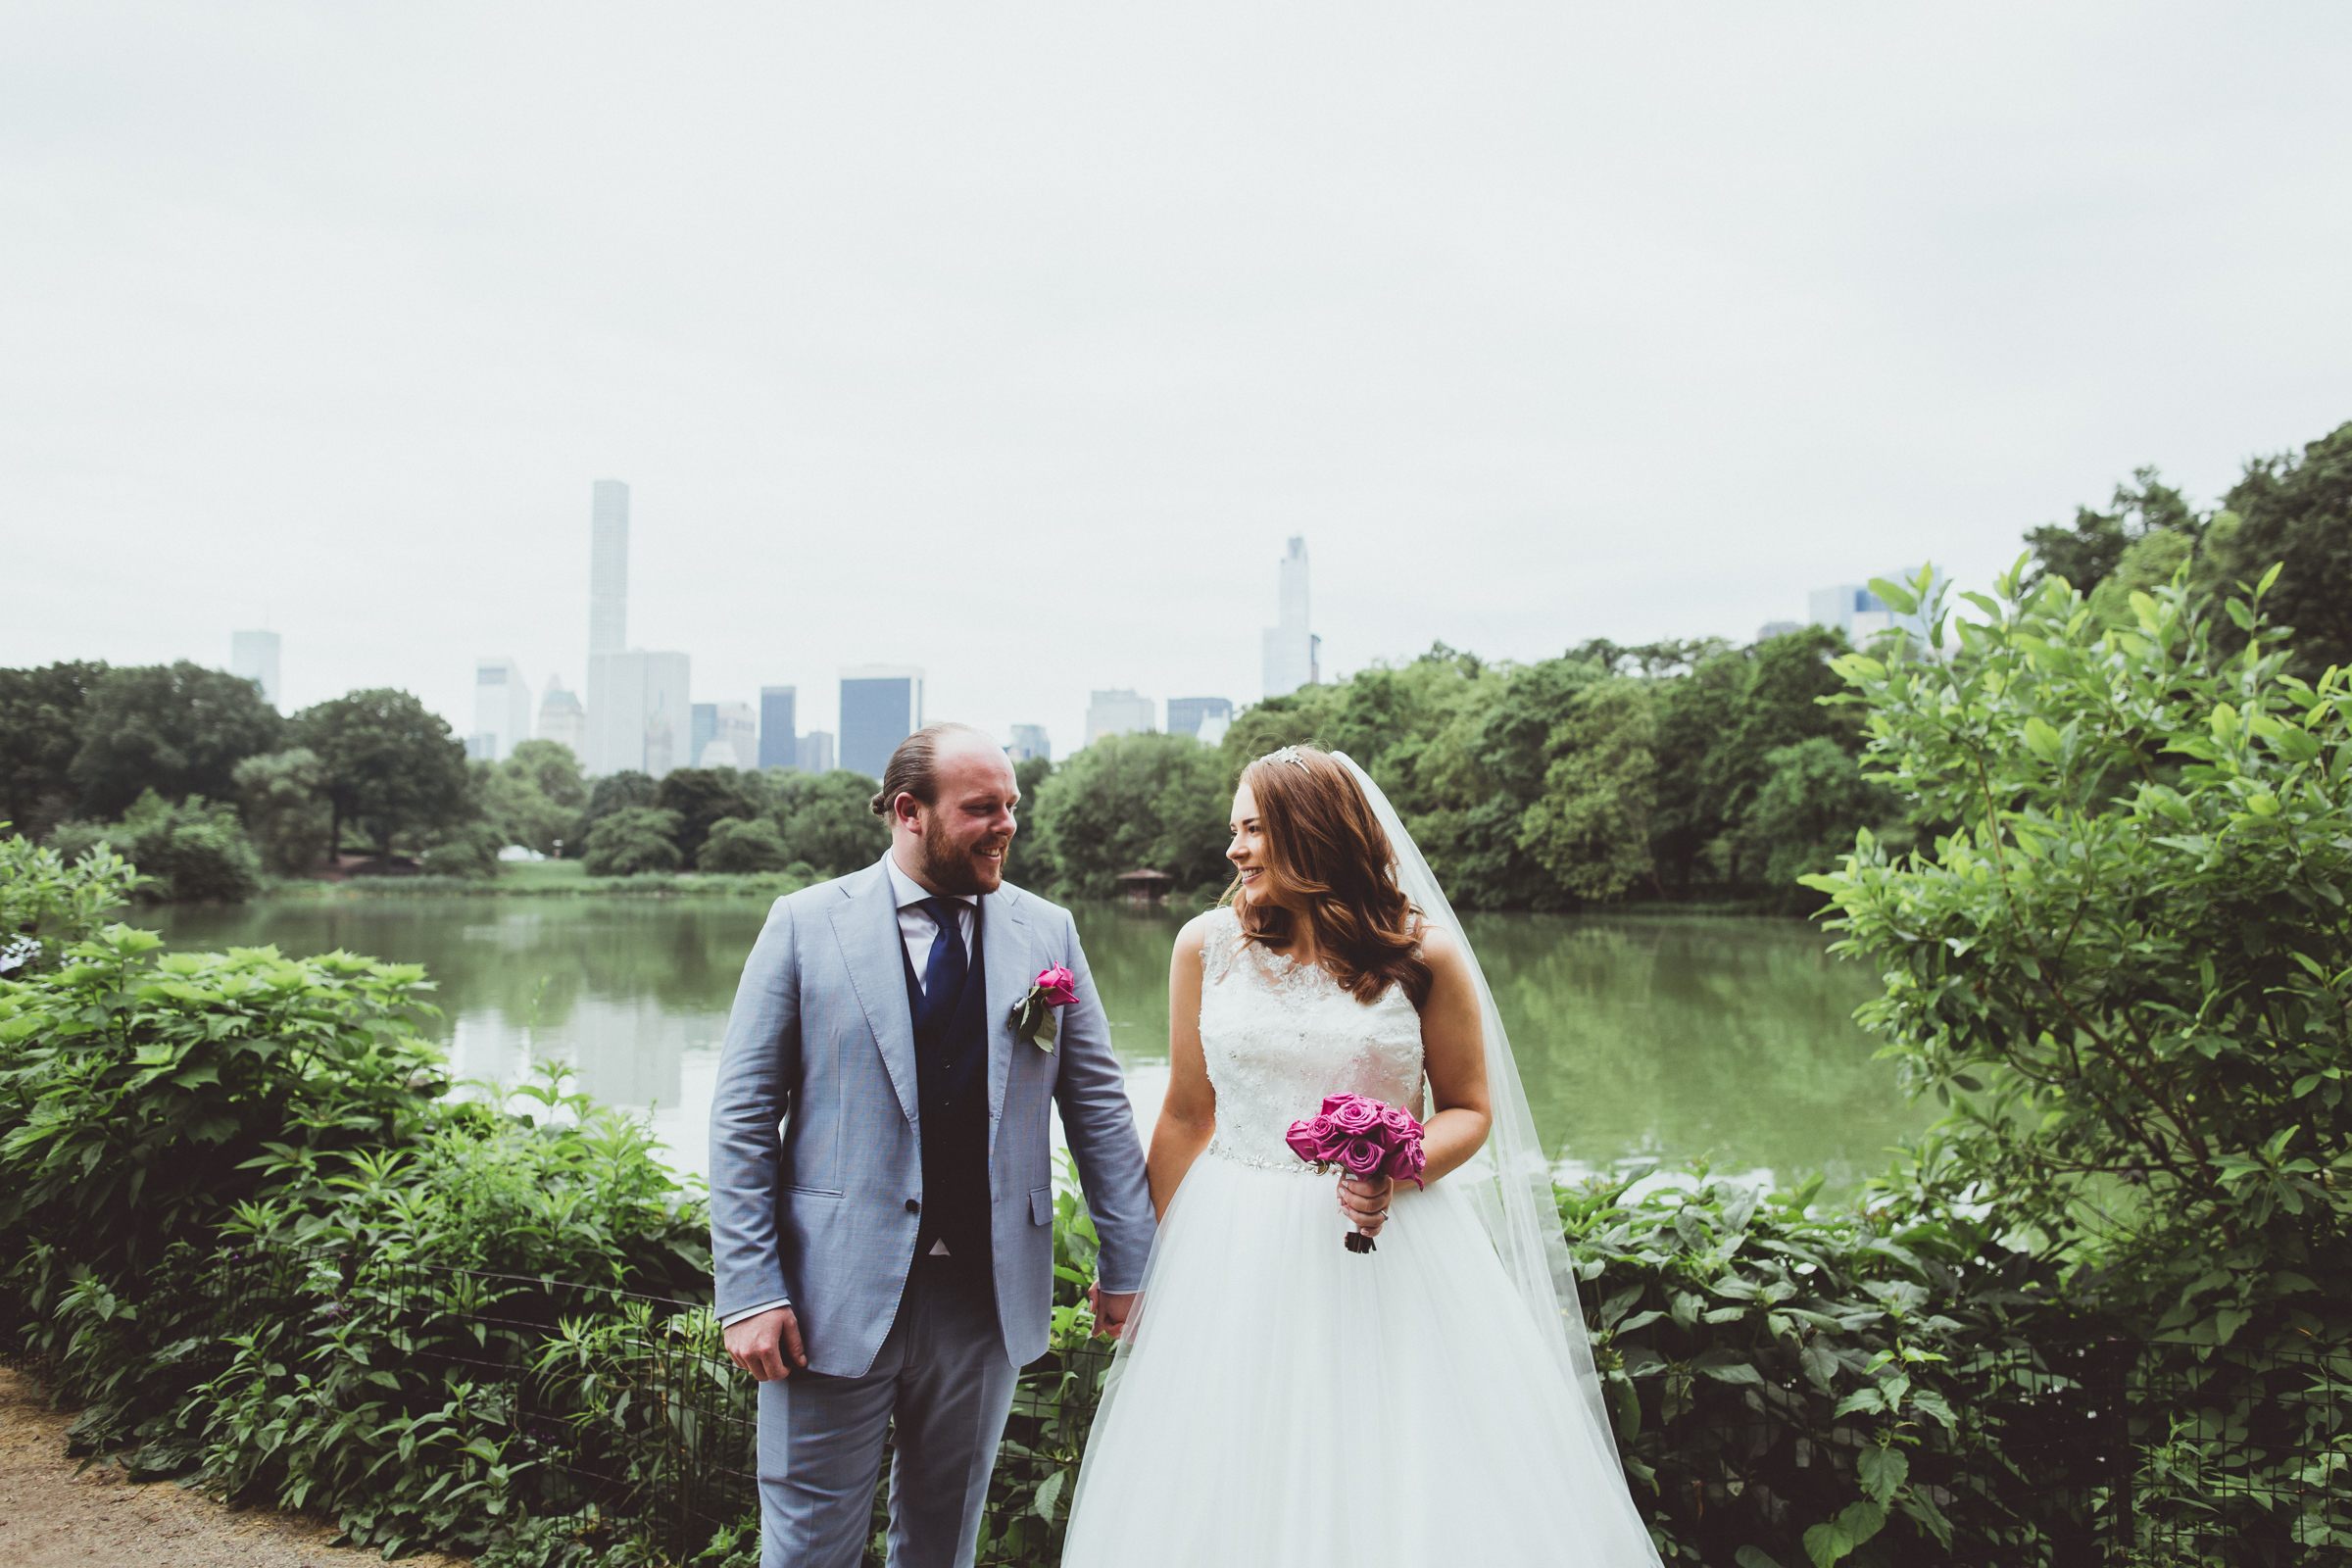 NYC-Central-Park-Elopement-New-York-Documentary-Wedding-Photographer-Dumbo-Brooklyn-Bridge-Park--24.jpg